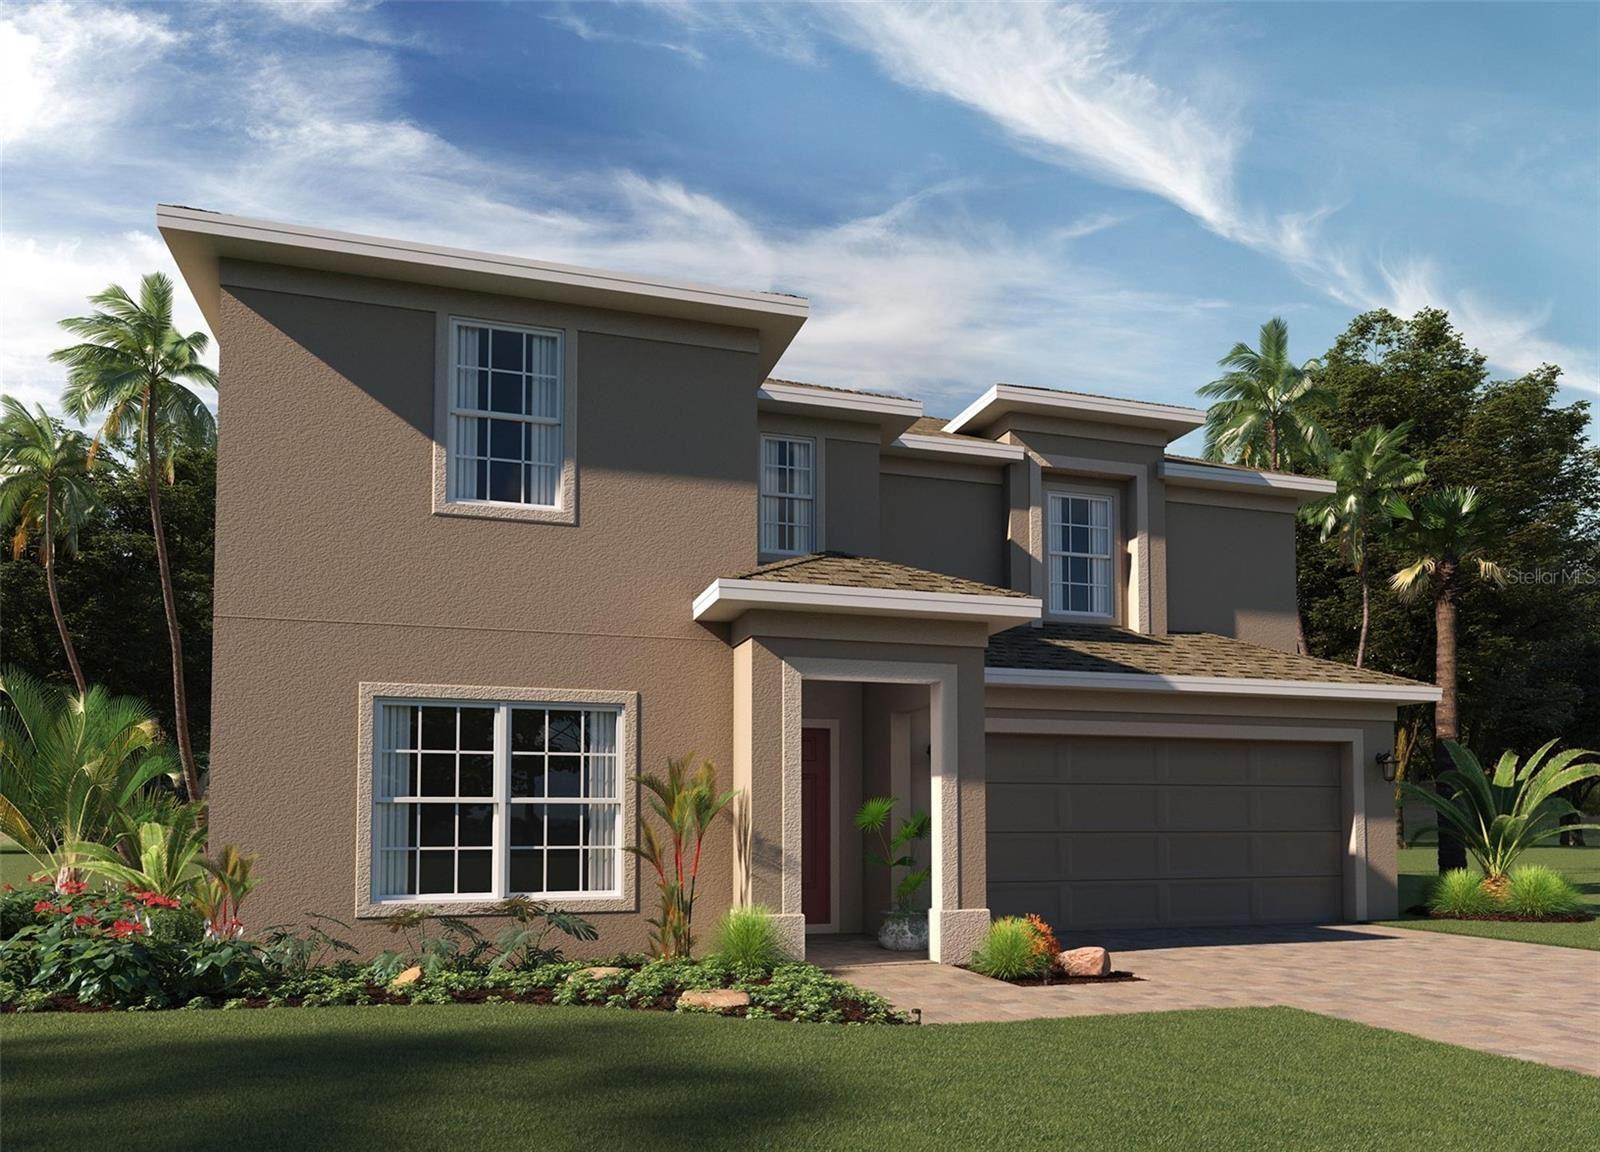 9385 ST THERESE STREET, Groveland, FL 34736 - #: O5974433